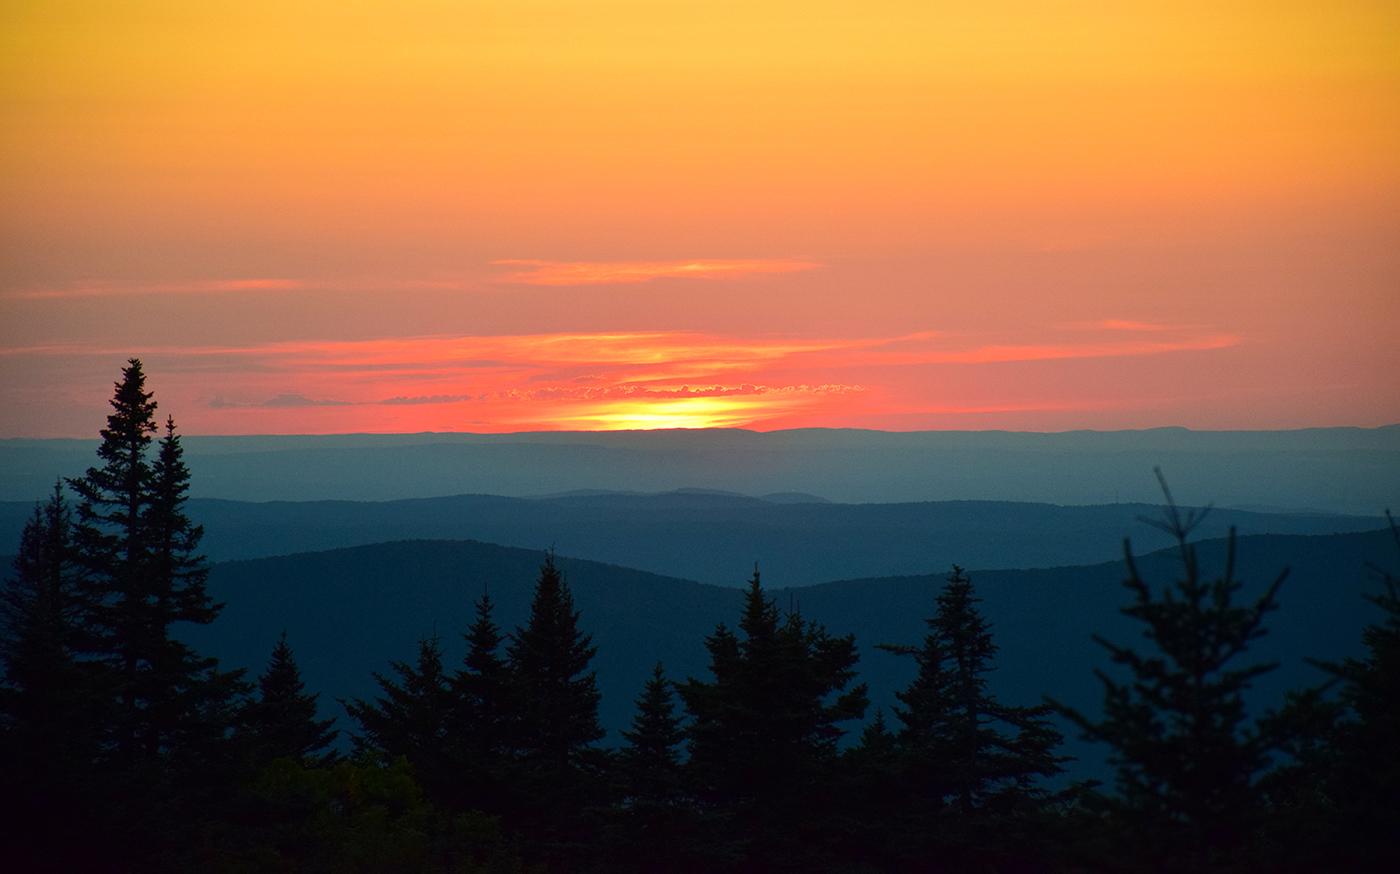 appalachian trail in massachusetts